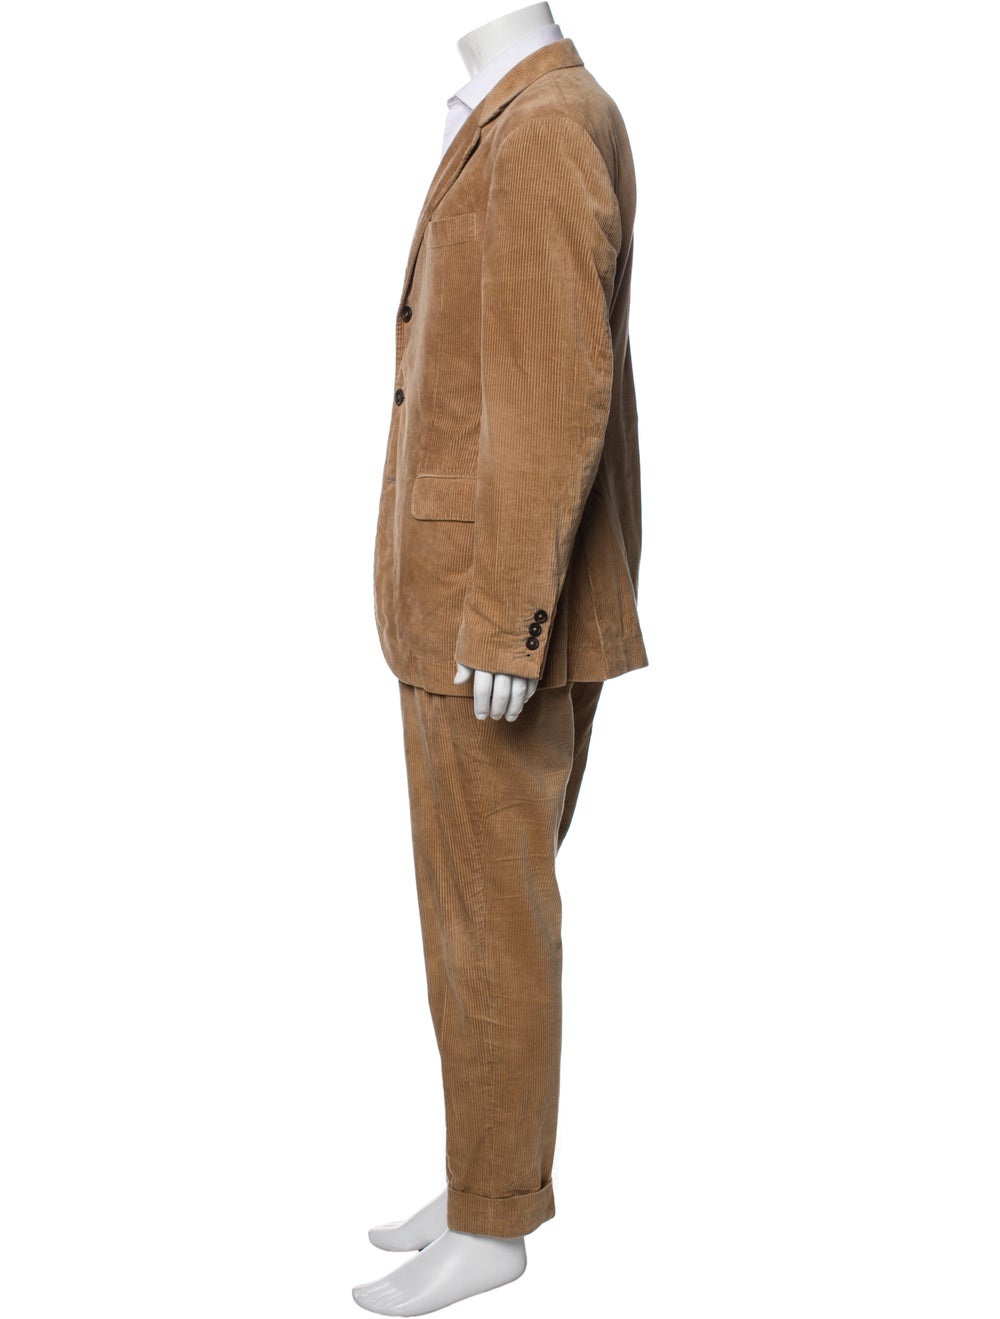 Brunello Cucinelli Two-Piece Suit - image 2